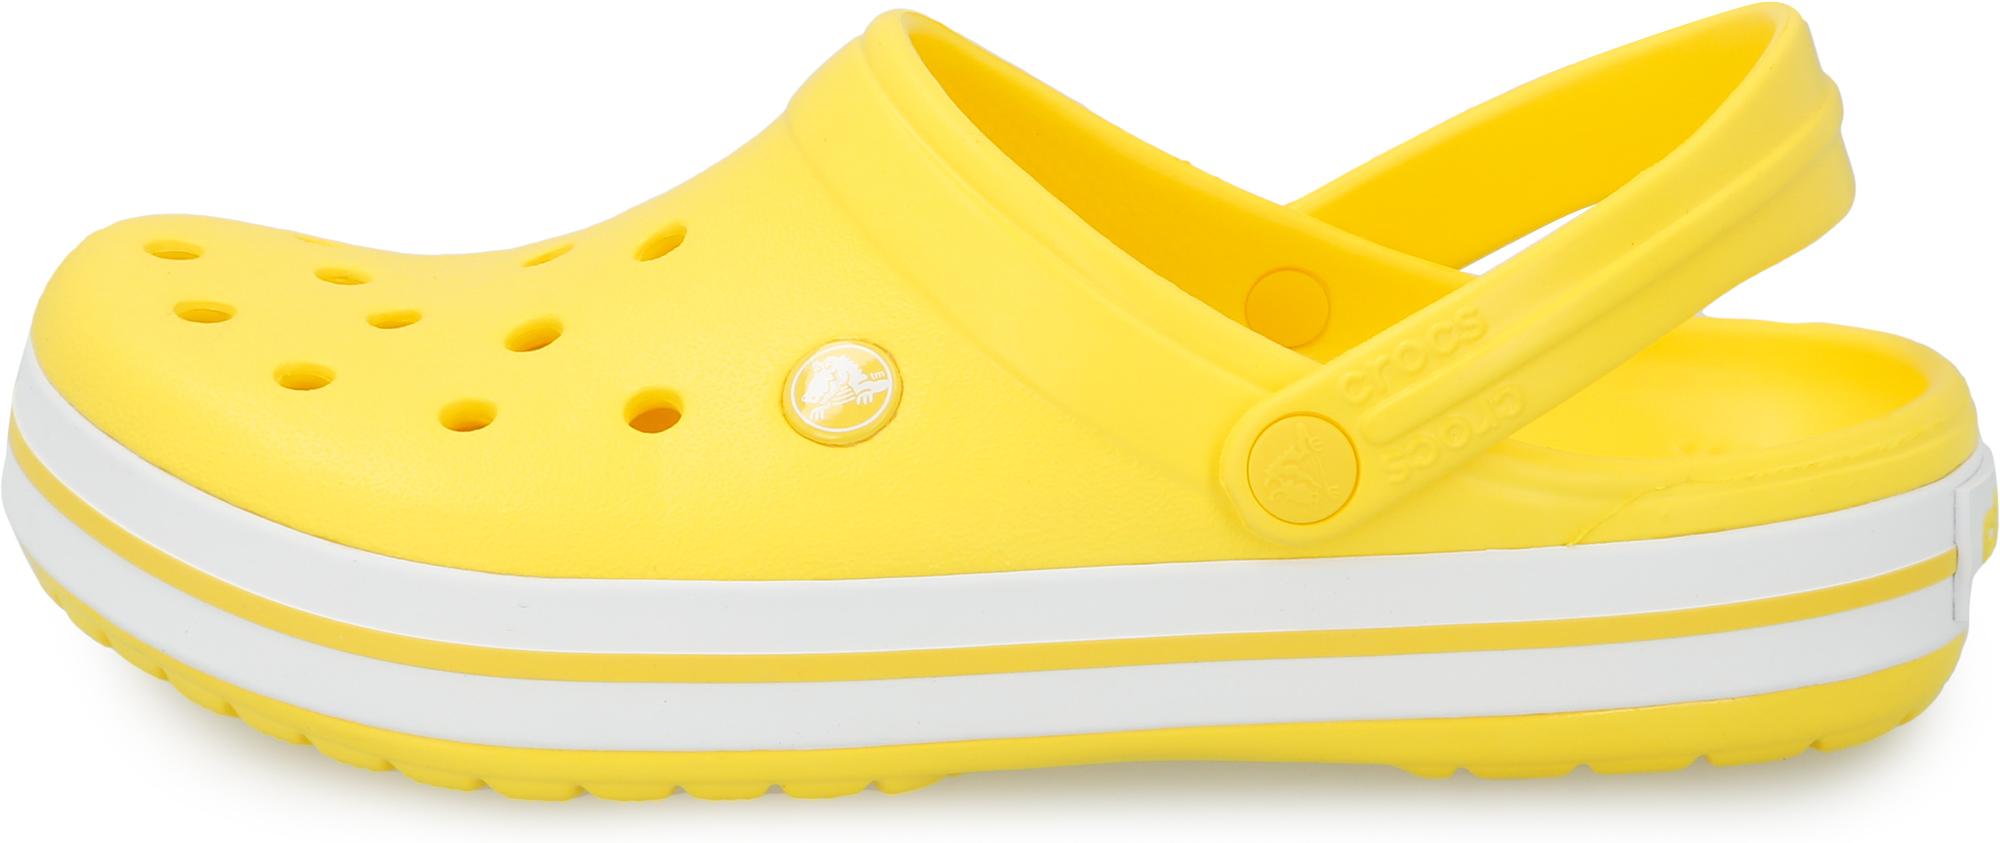 цена на Crocs Шлепанцы Crocs Crocband, размер 40-41